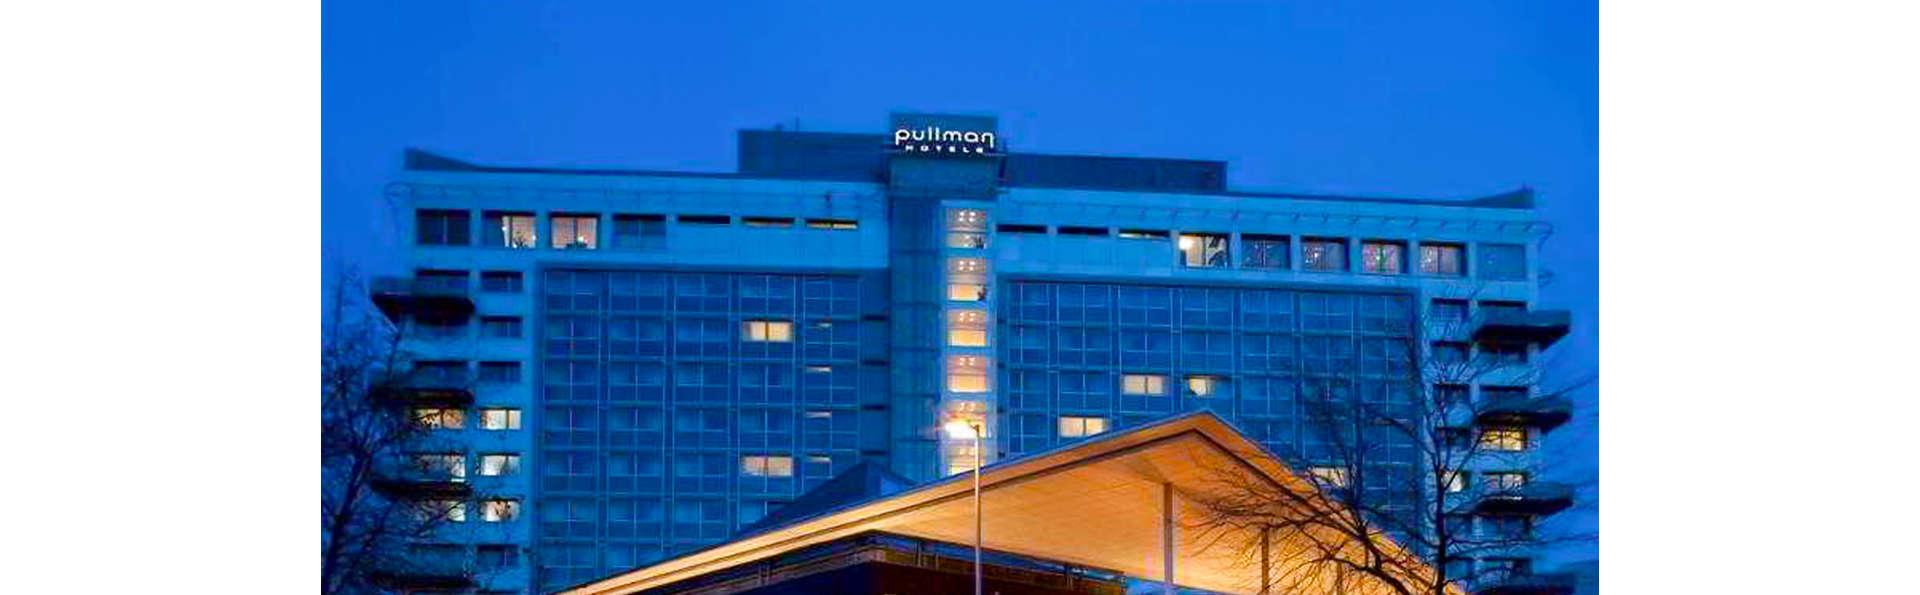 Pullman Köln - EDIT_FRONT_01.jpg